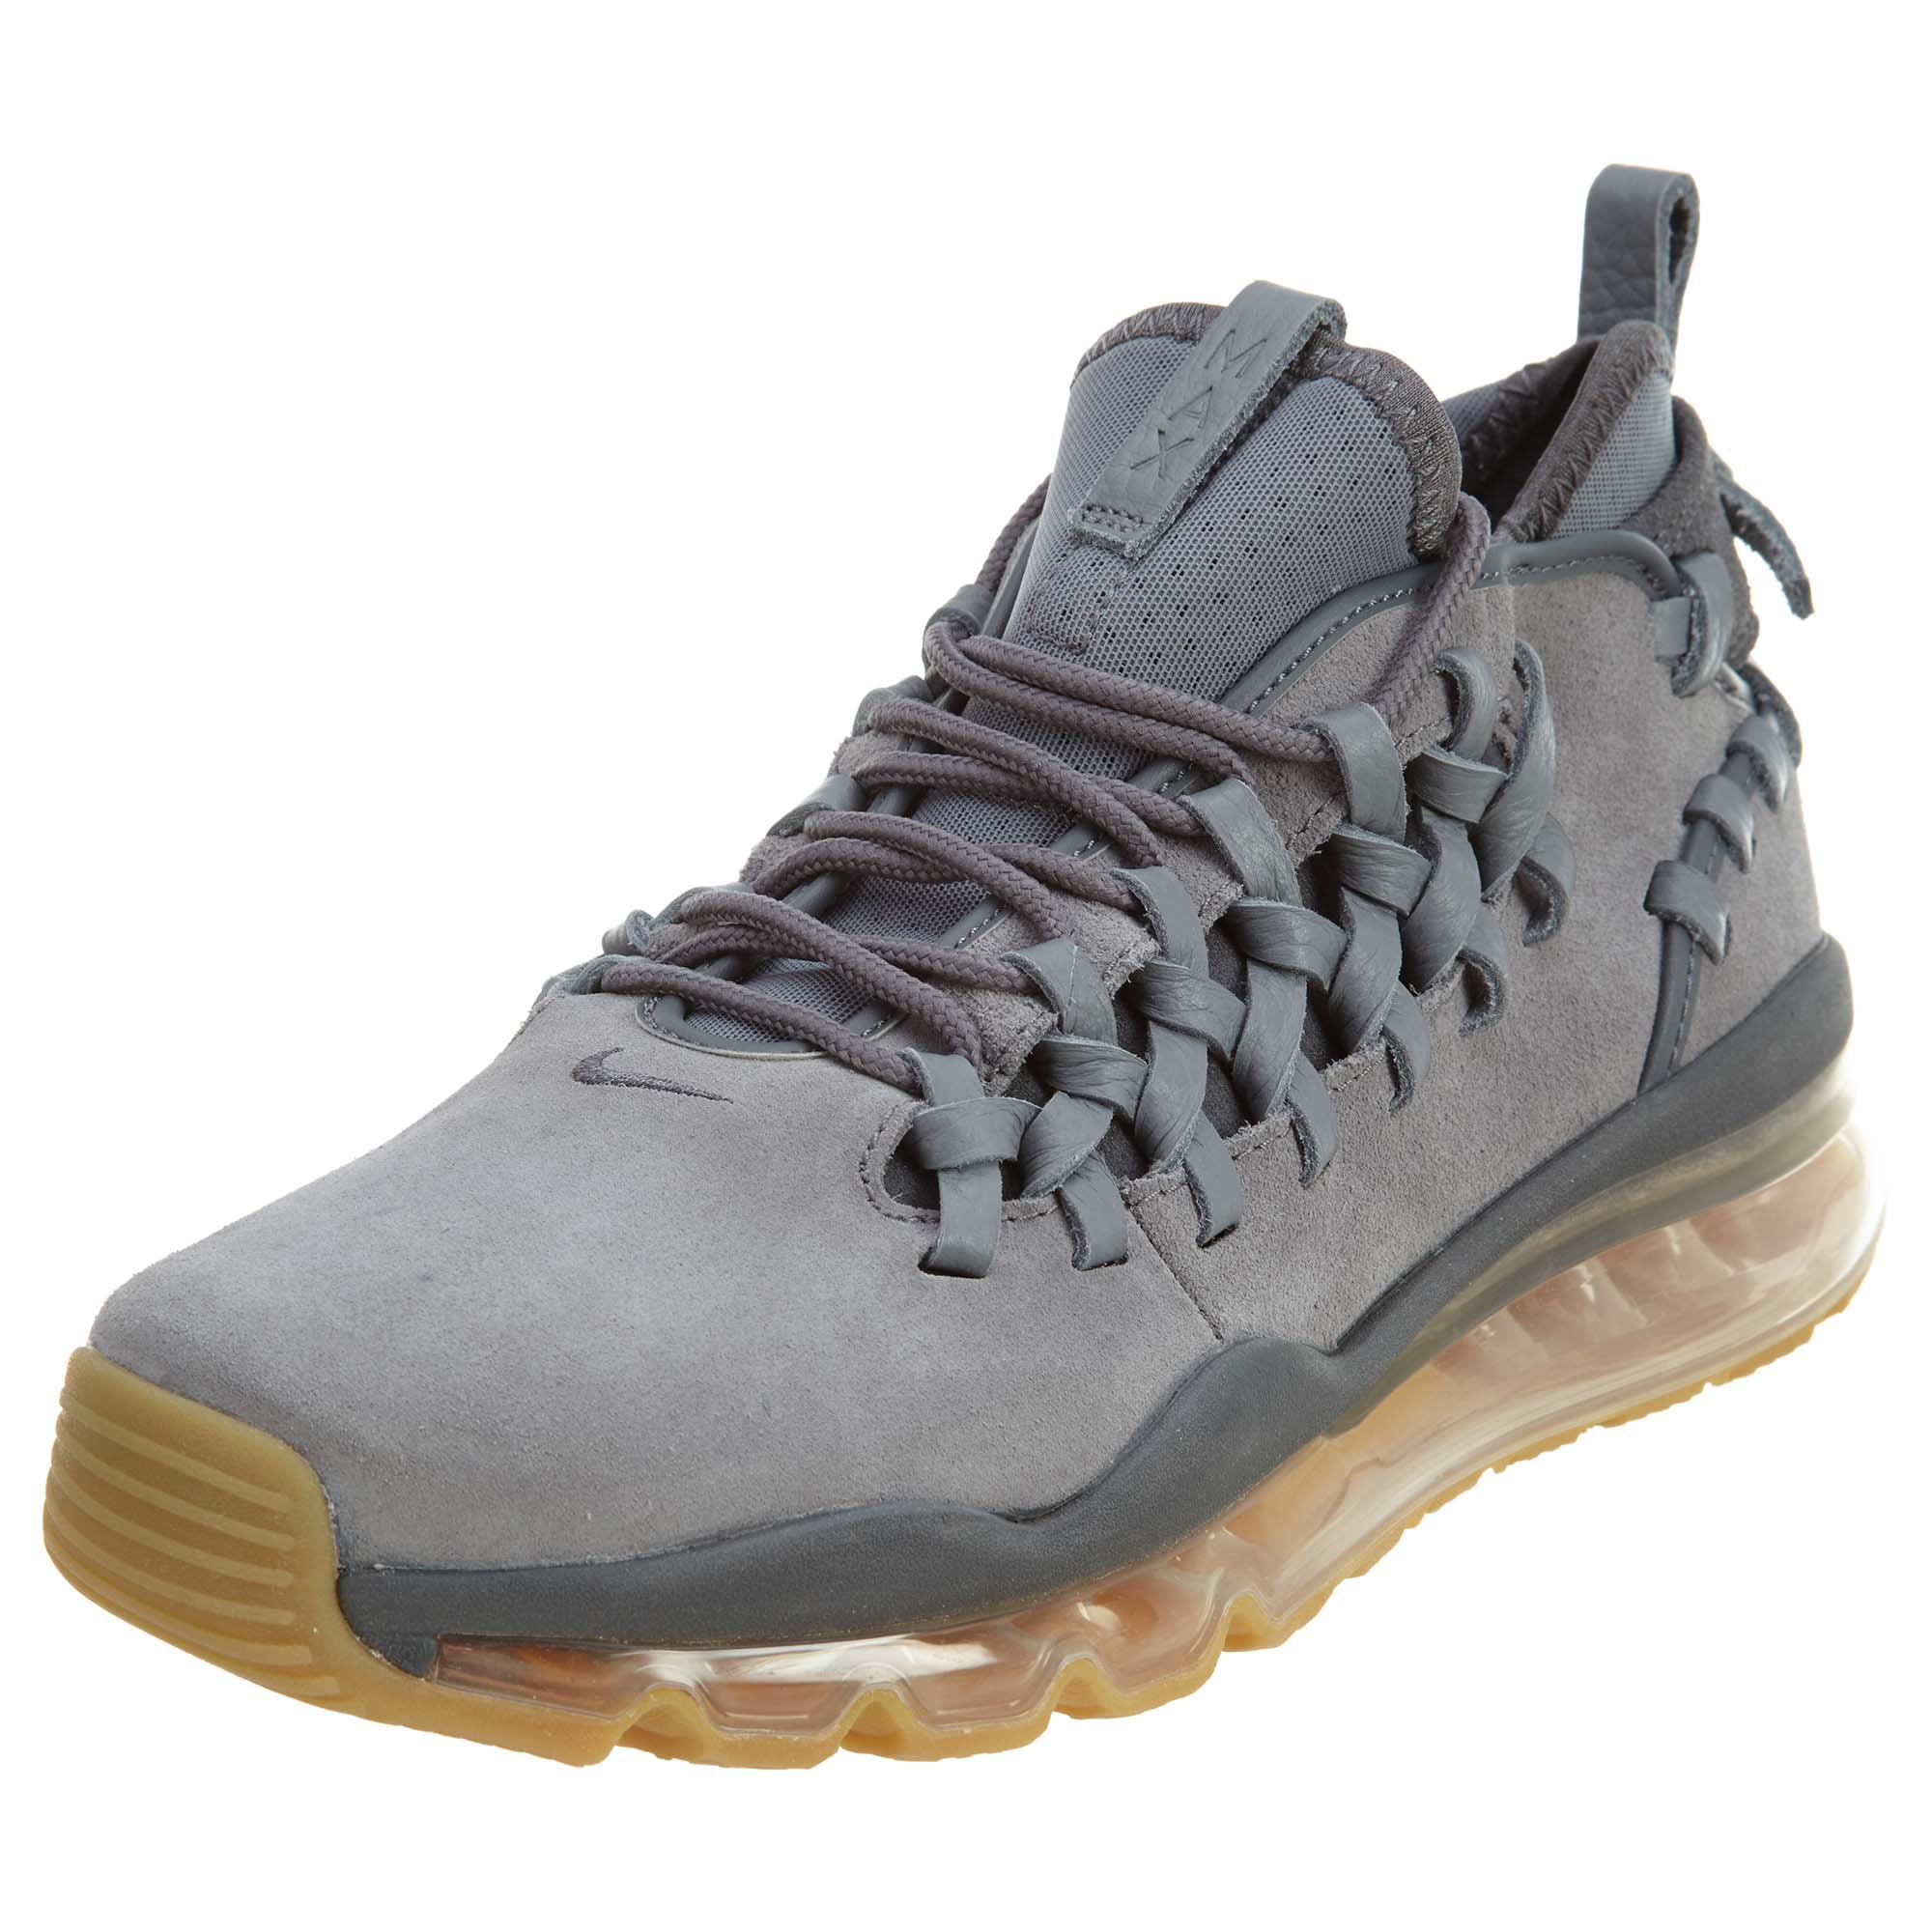 Nike Air Max Tr17 Mens Style : 880996